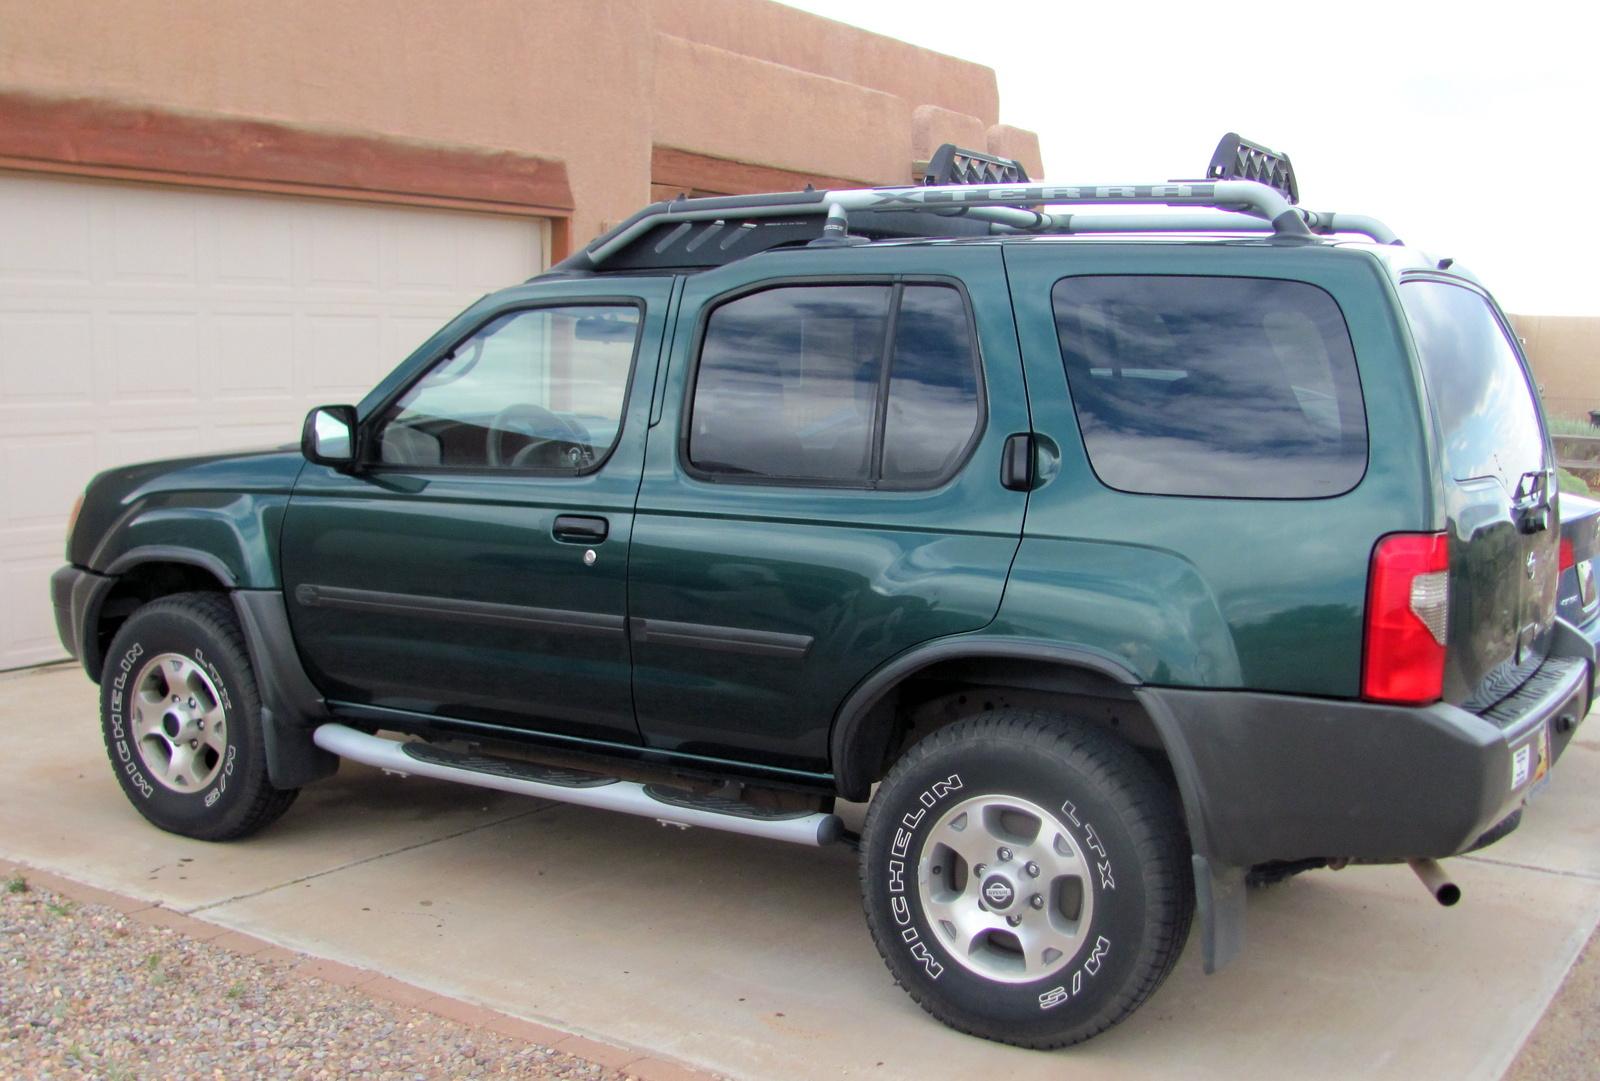 2000 Nissan Xterra Pictures Cargurus